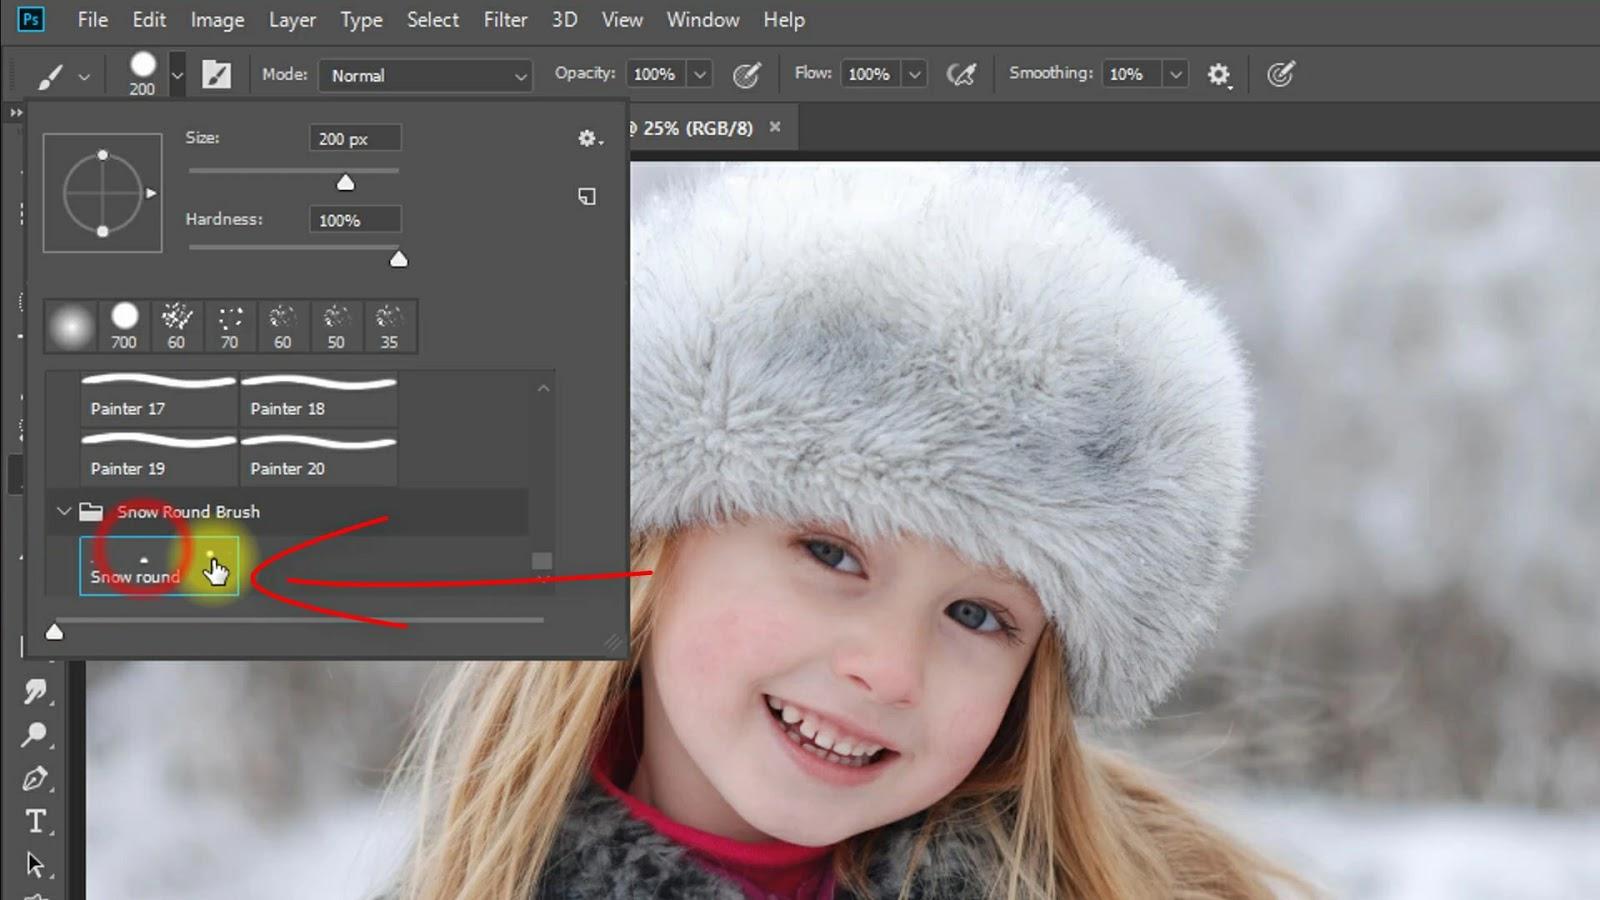 1-Click Automatic Realistic SNOW EFFECT Screenshot 4